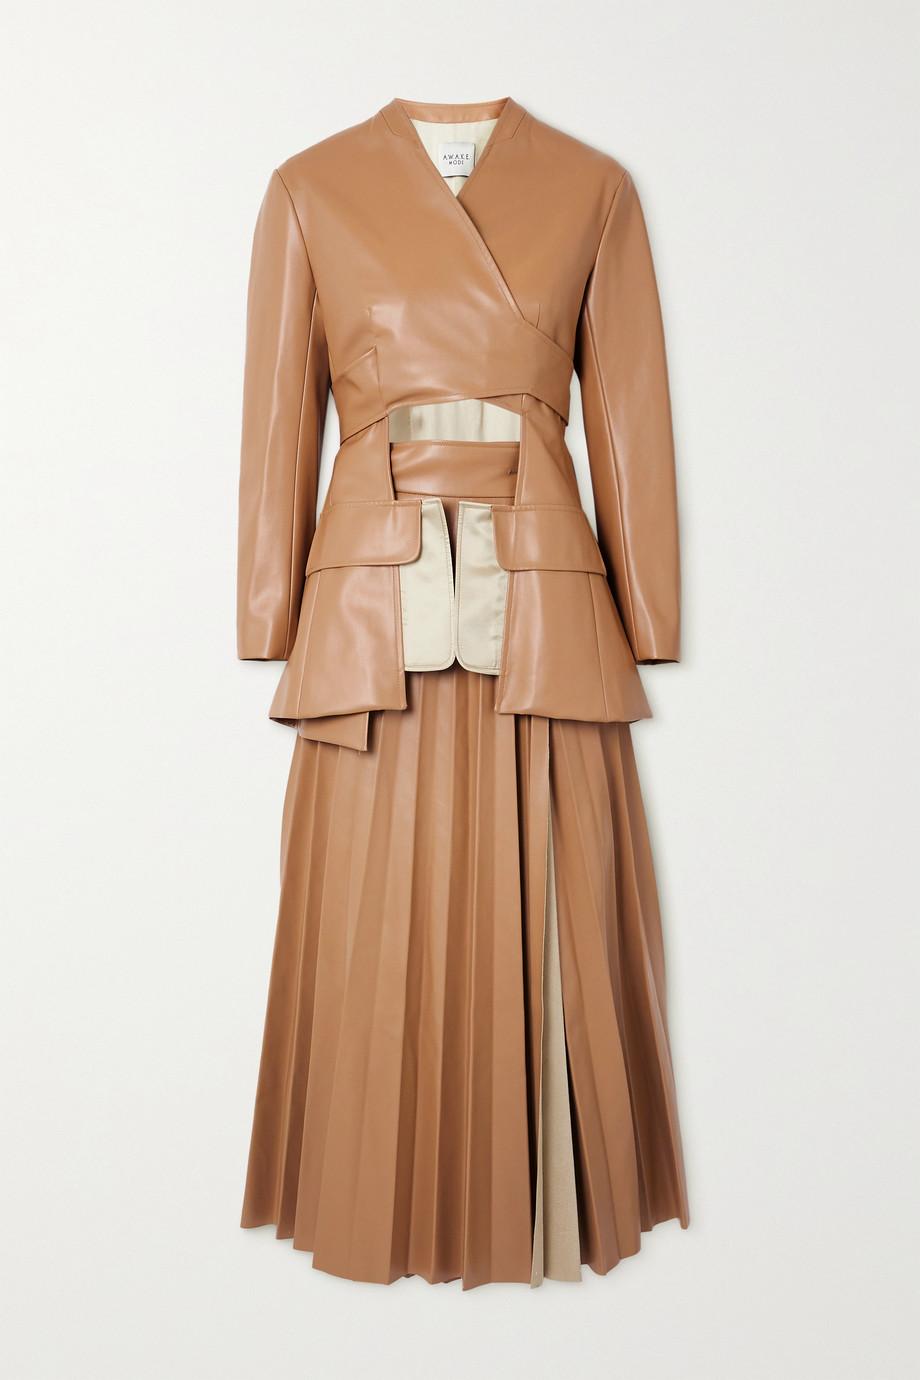 A.W.A.K.E. MODE Cutout pleated faux leather wrap maxi dress